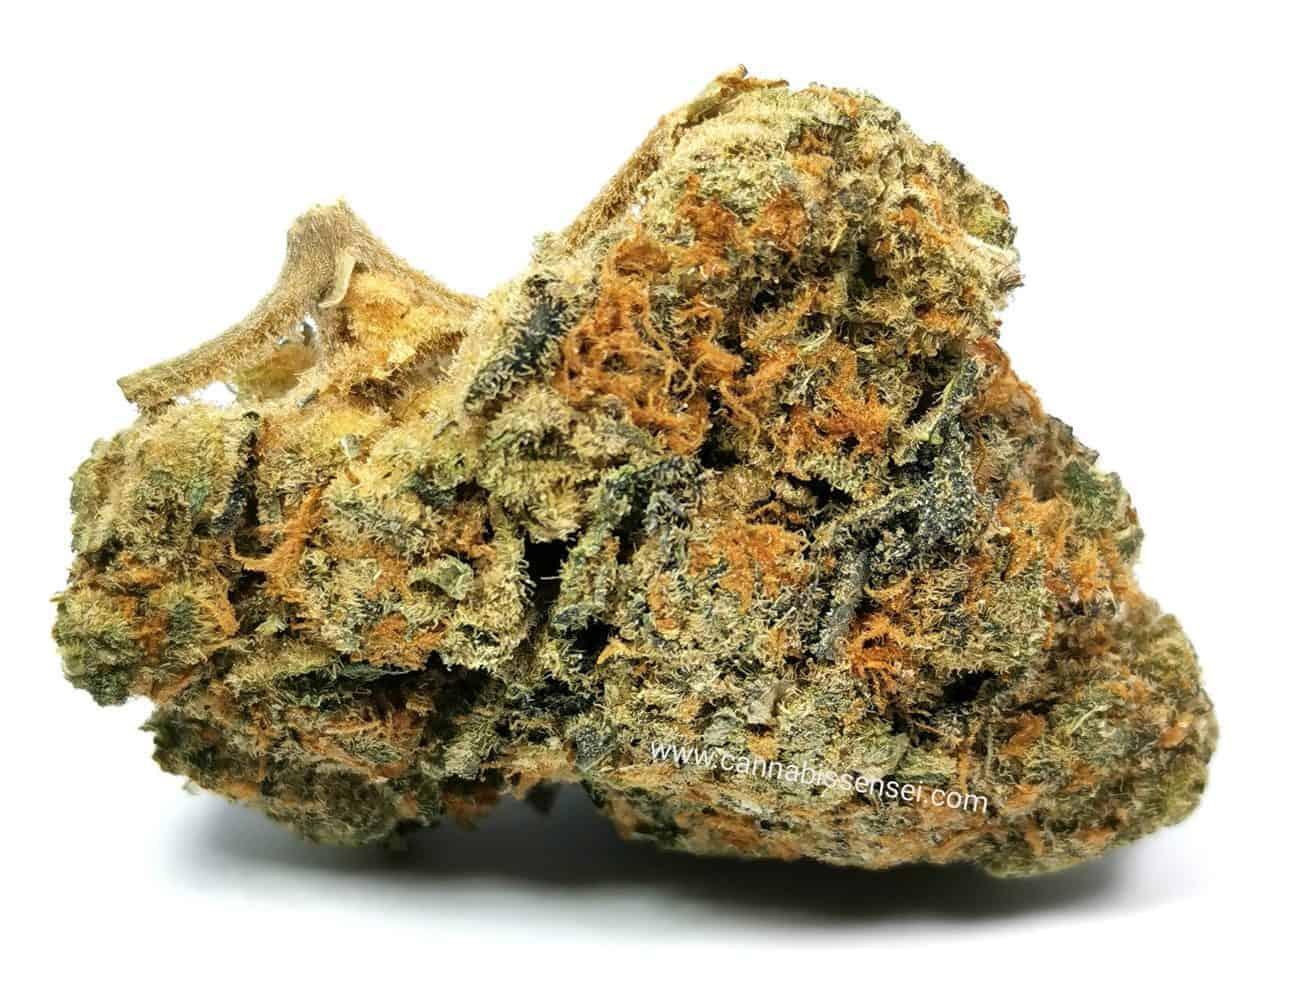 grapefrui GG4 strain review, pictur of cannabis